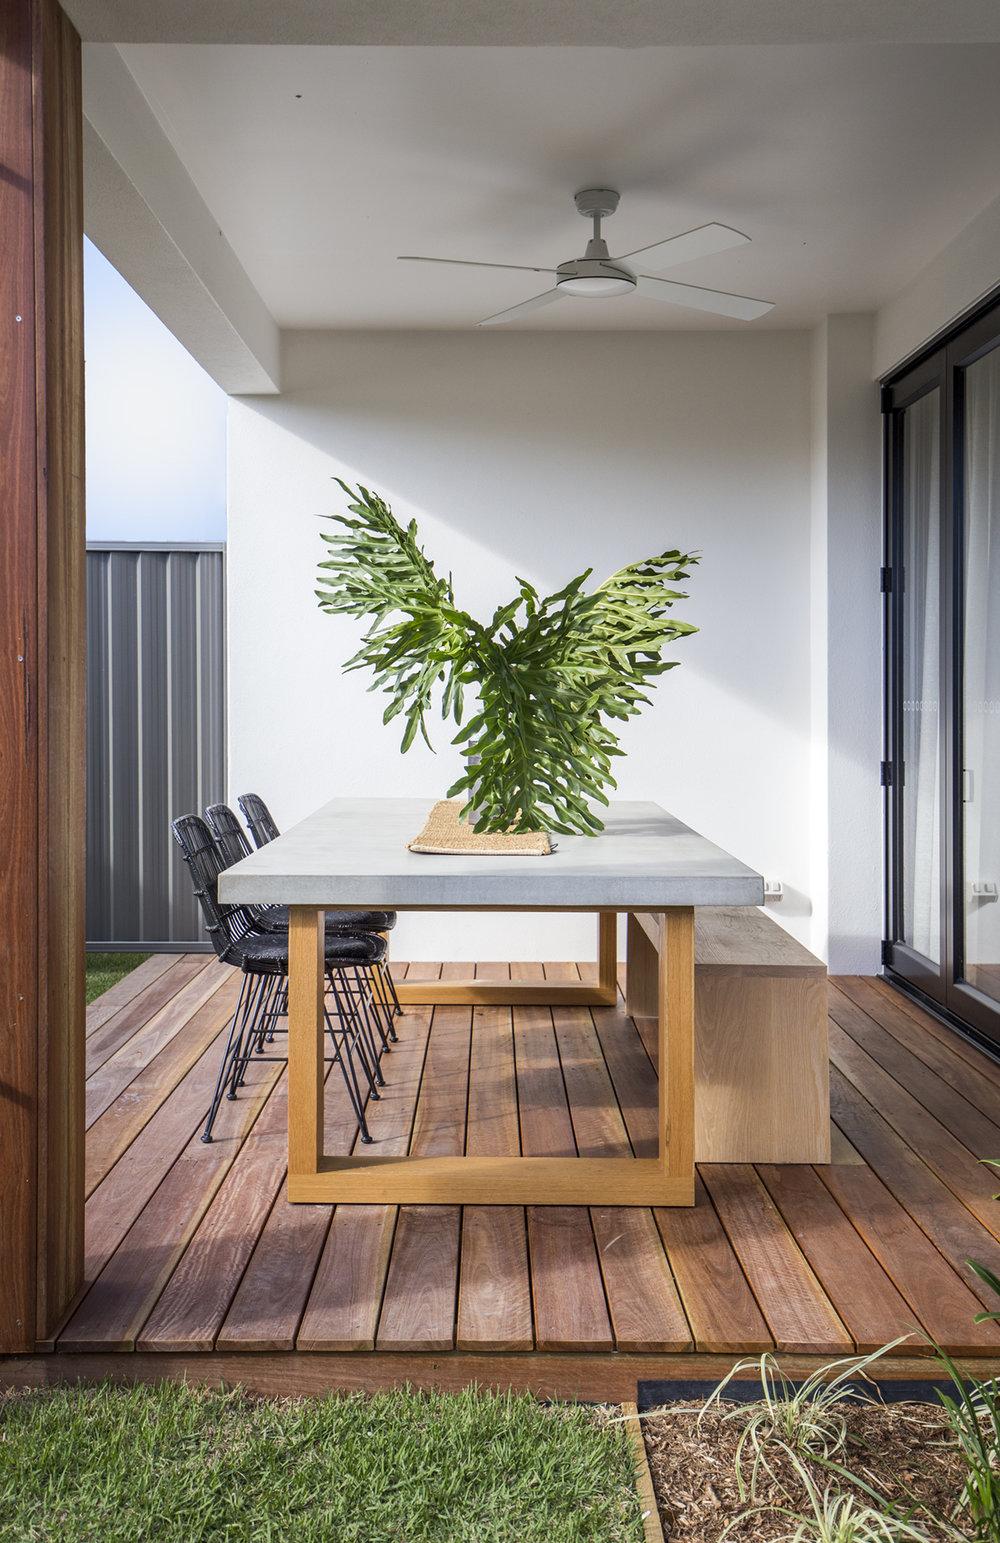 Kira and Kira - Gold Coast Property Styling - Home Interiors - Furniture DesignIMG_6792 - small.jpg